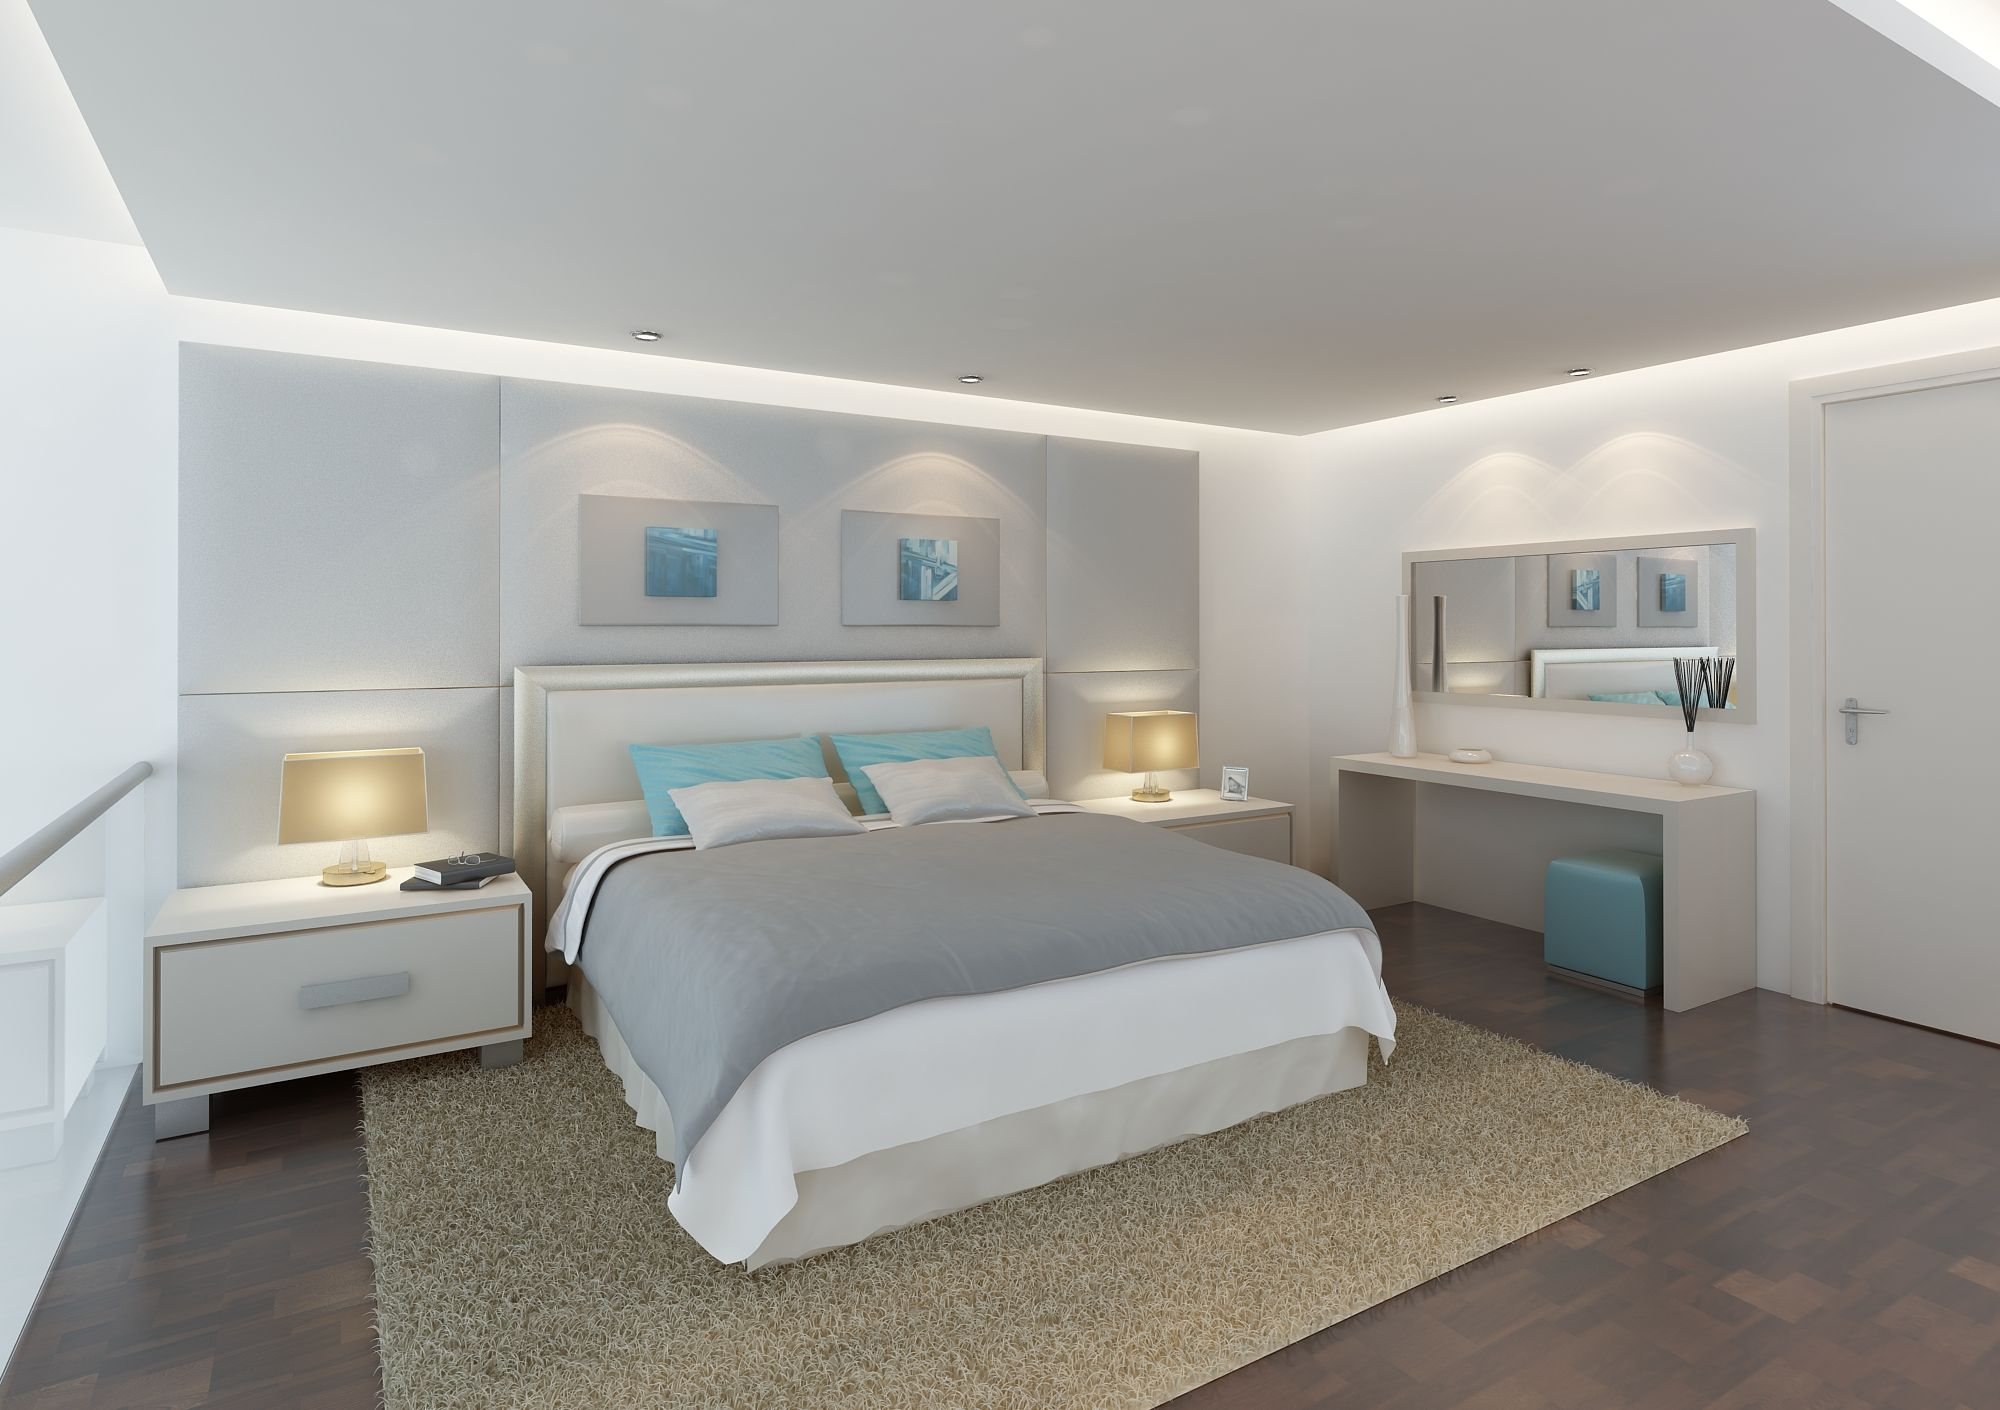 Loft montevideo uruguay a o 2010 dormitorio en segunda for Casas de muebles en montevideo